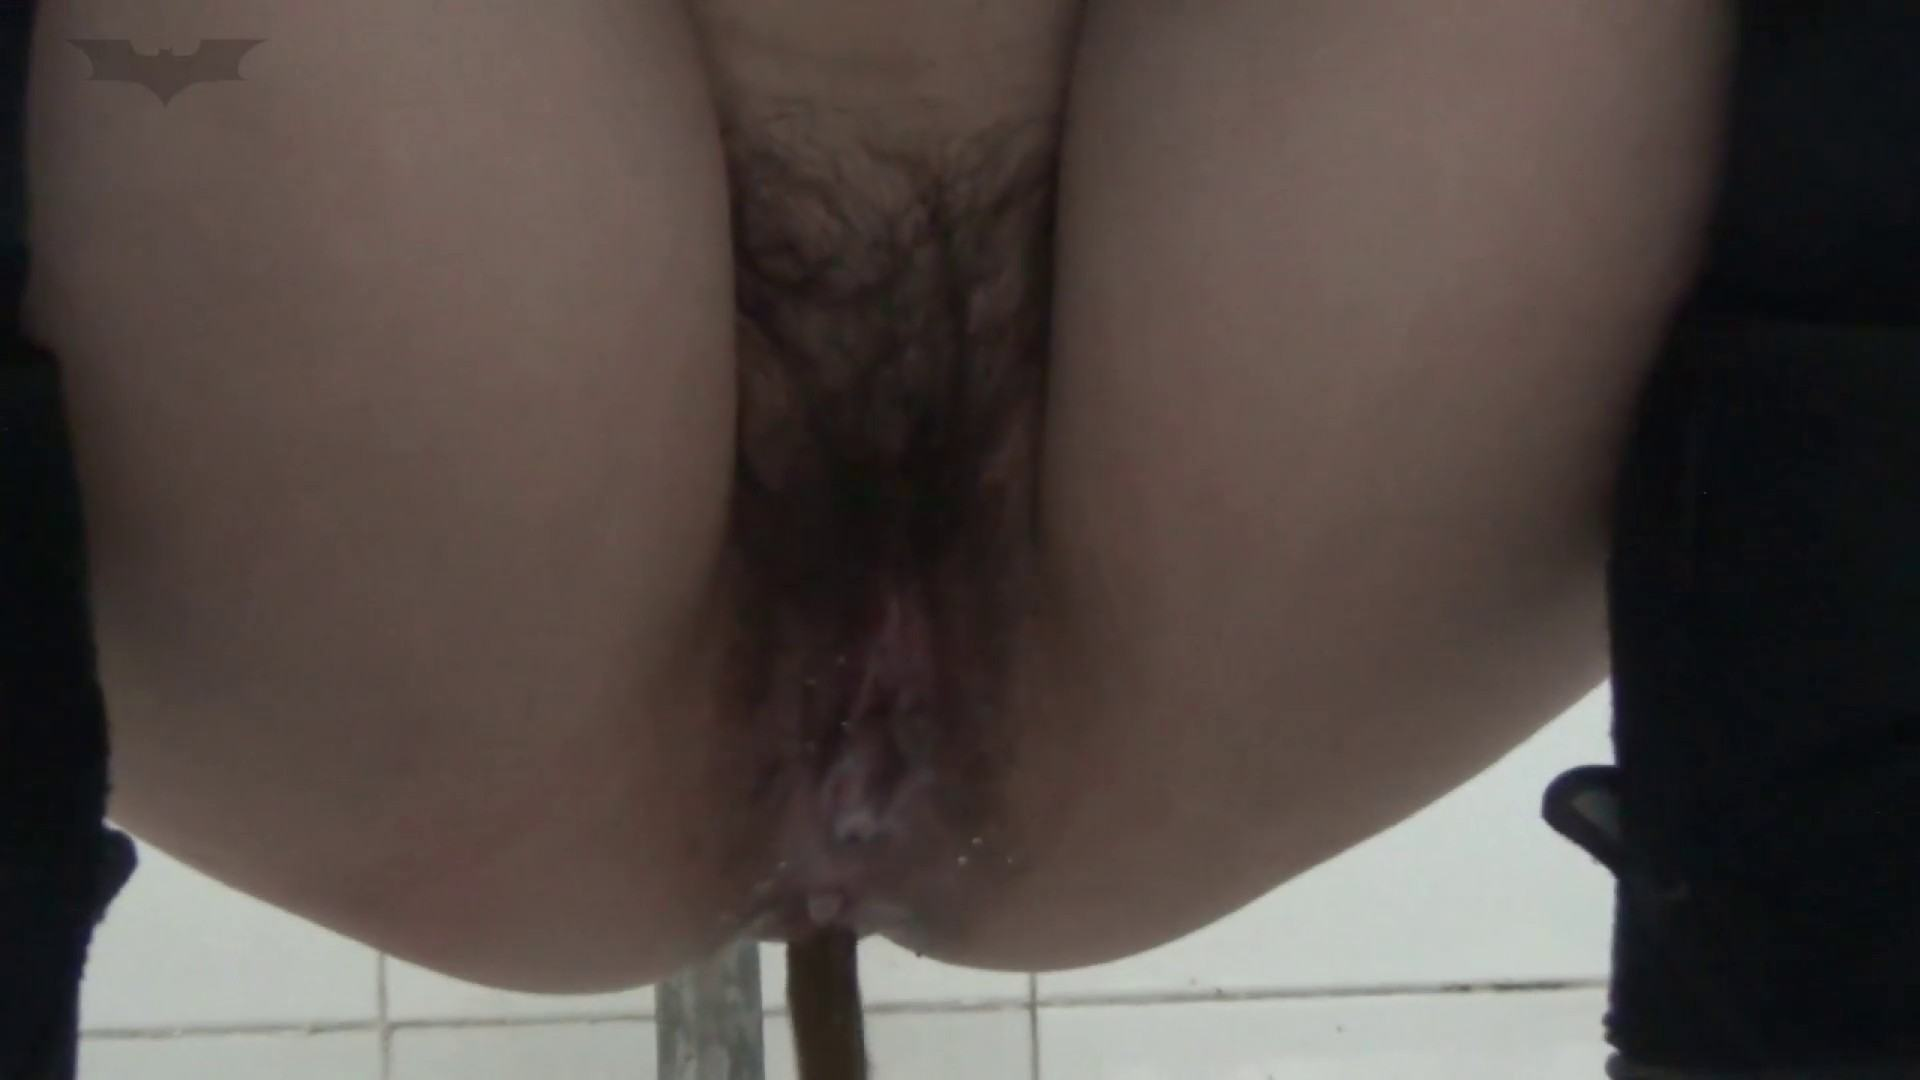 JD盗撮 美女の洗面所の秘密 Vol.37 OLの実態 盗撮オマンコ無修正動画無料 47pic 12